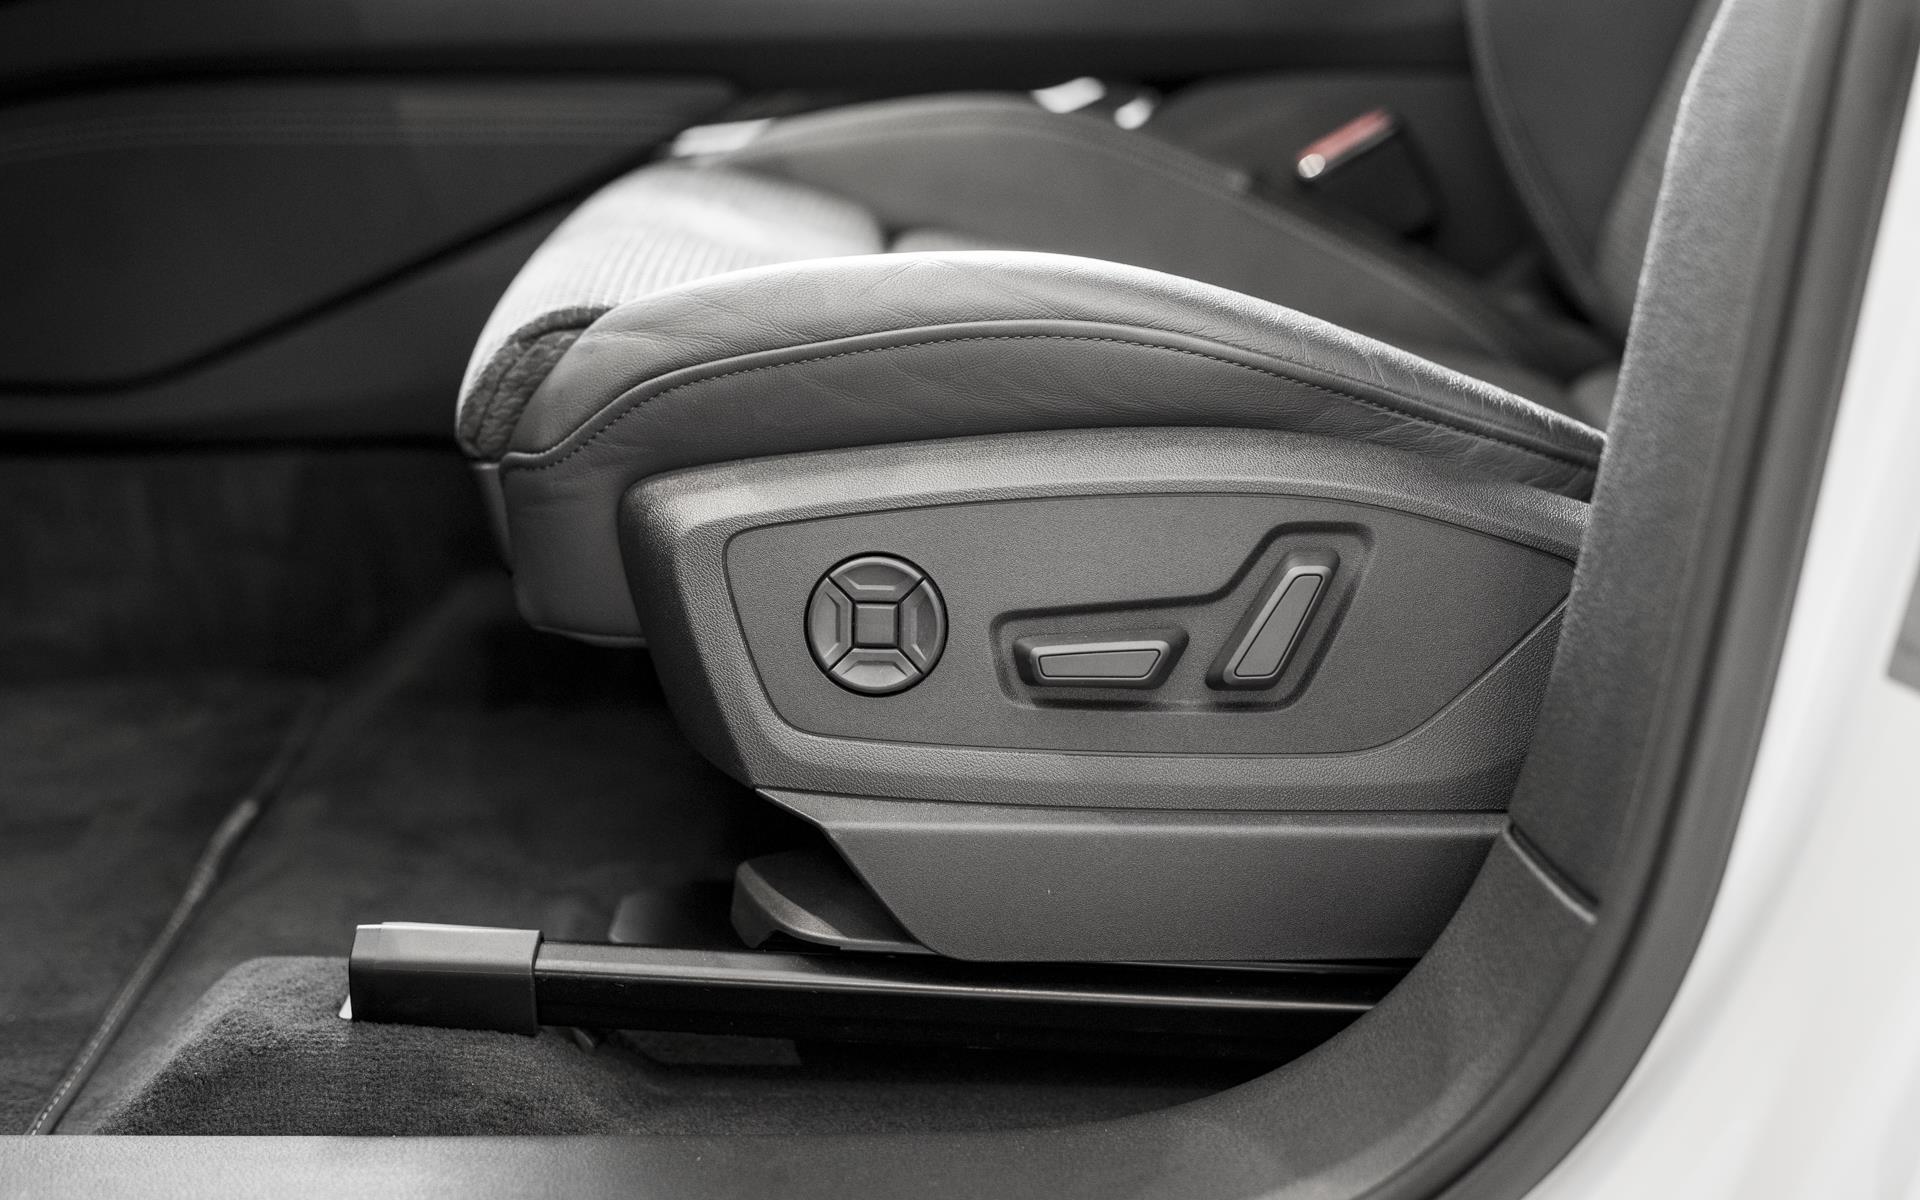 EL Advanced Quattro 408HK 5d Trinl. Gear image10